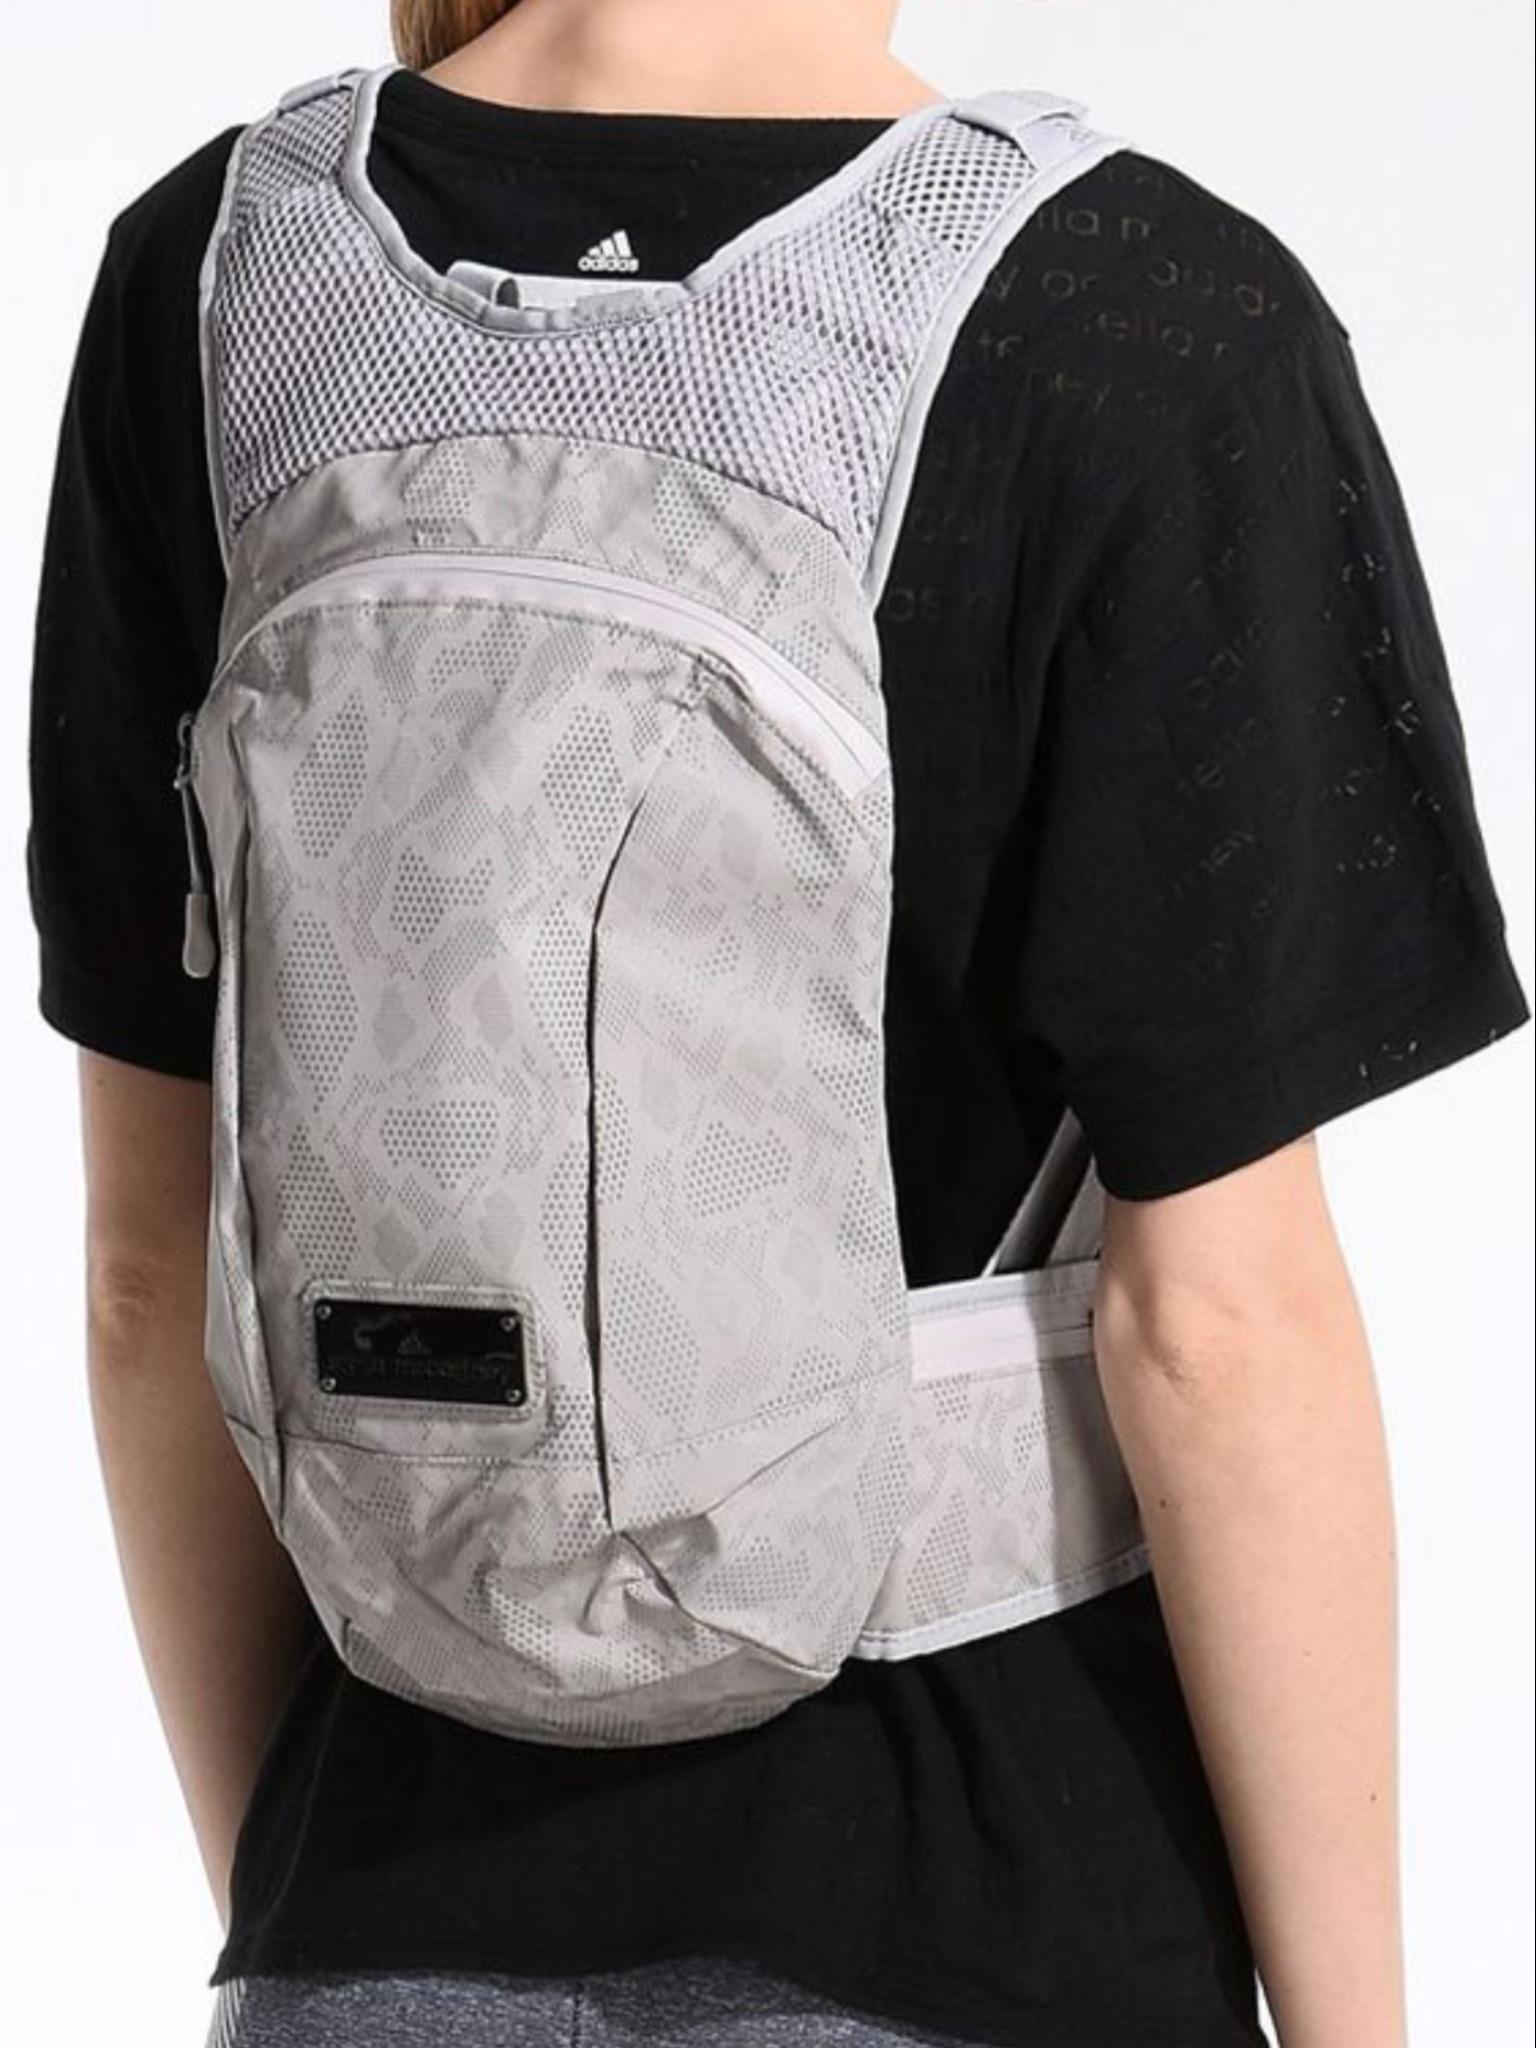 Adidas x Stella McCartney Reflective shell and mesh backpack